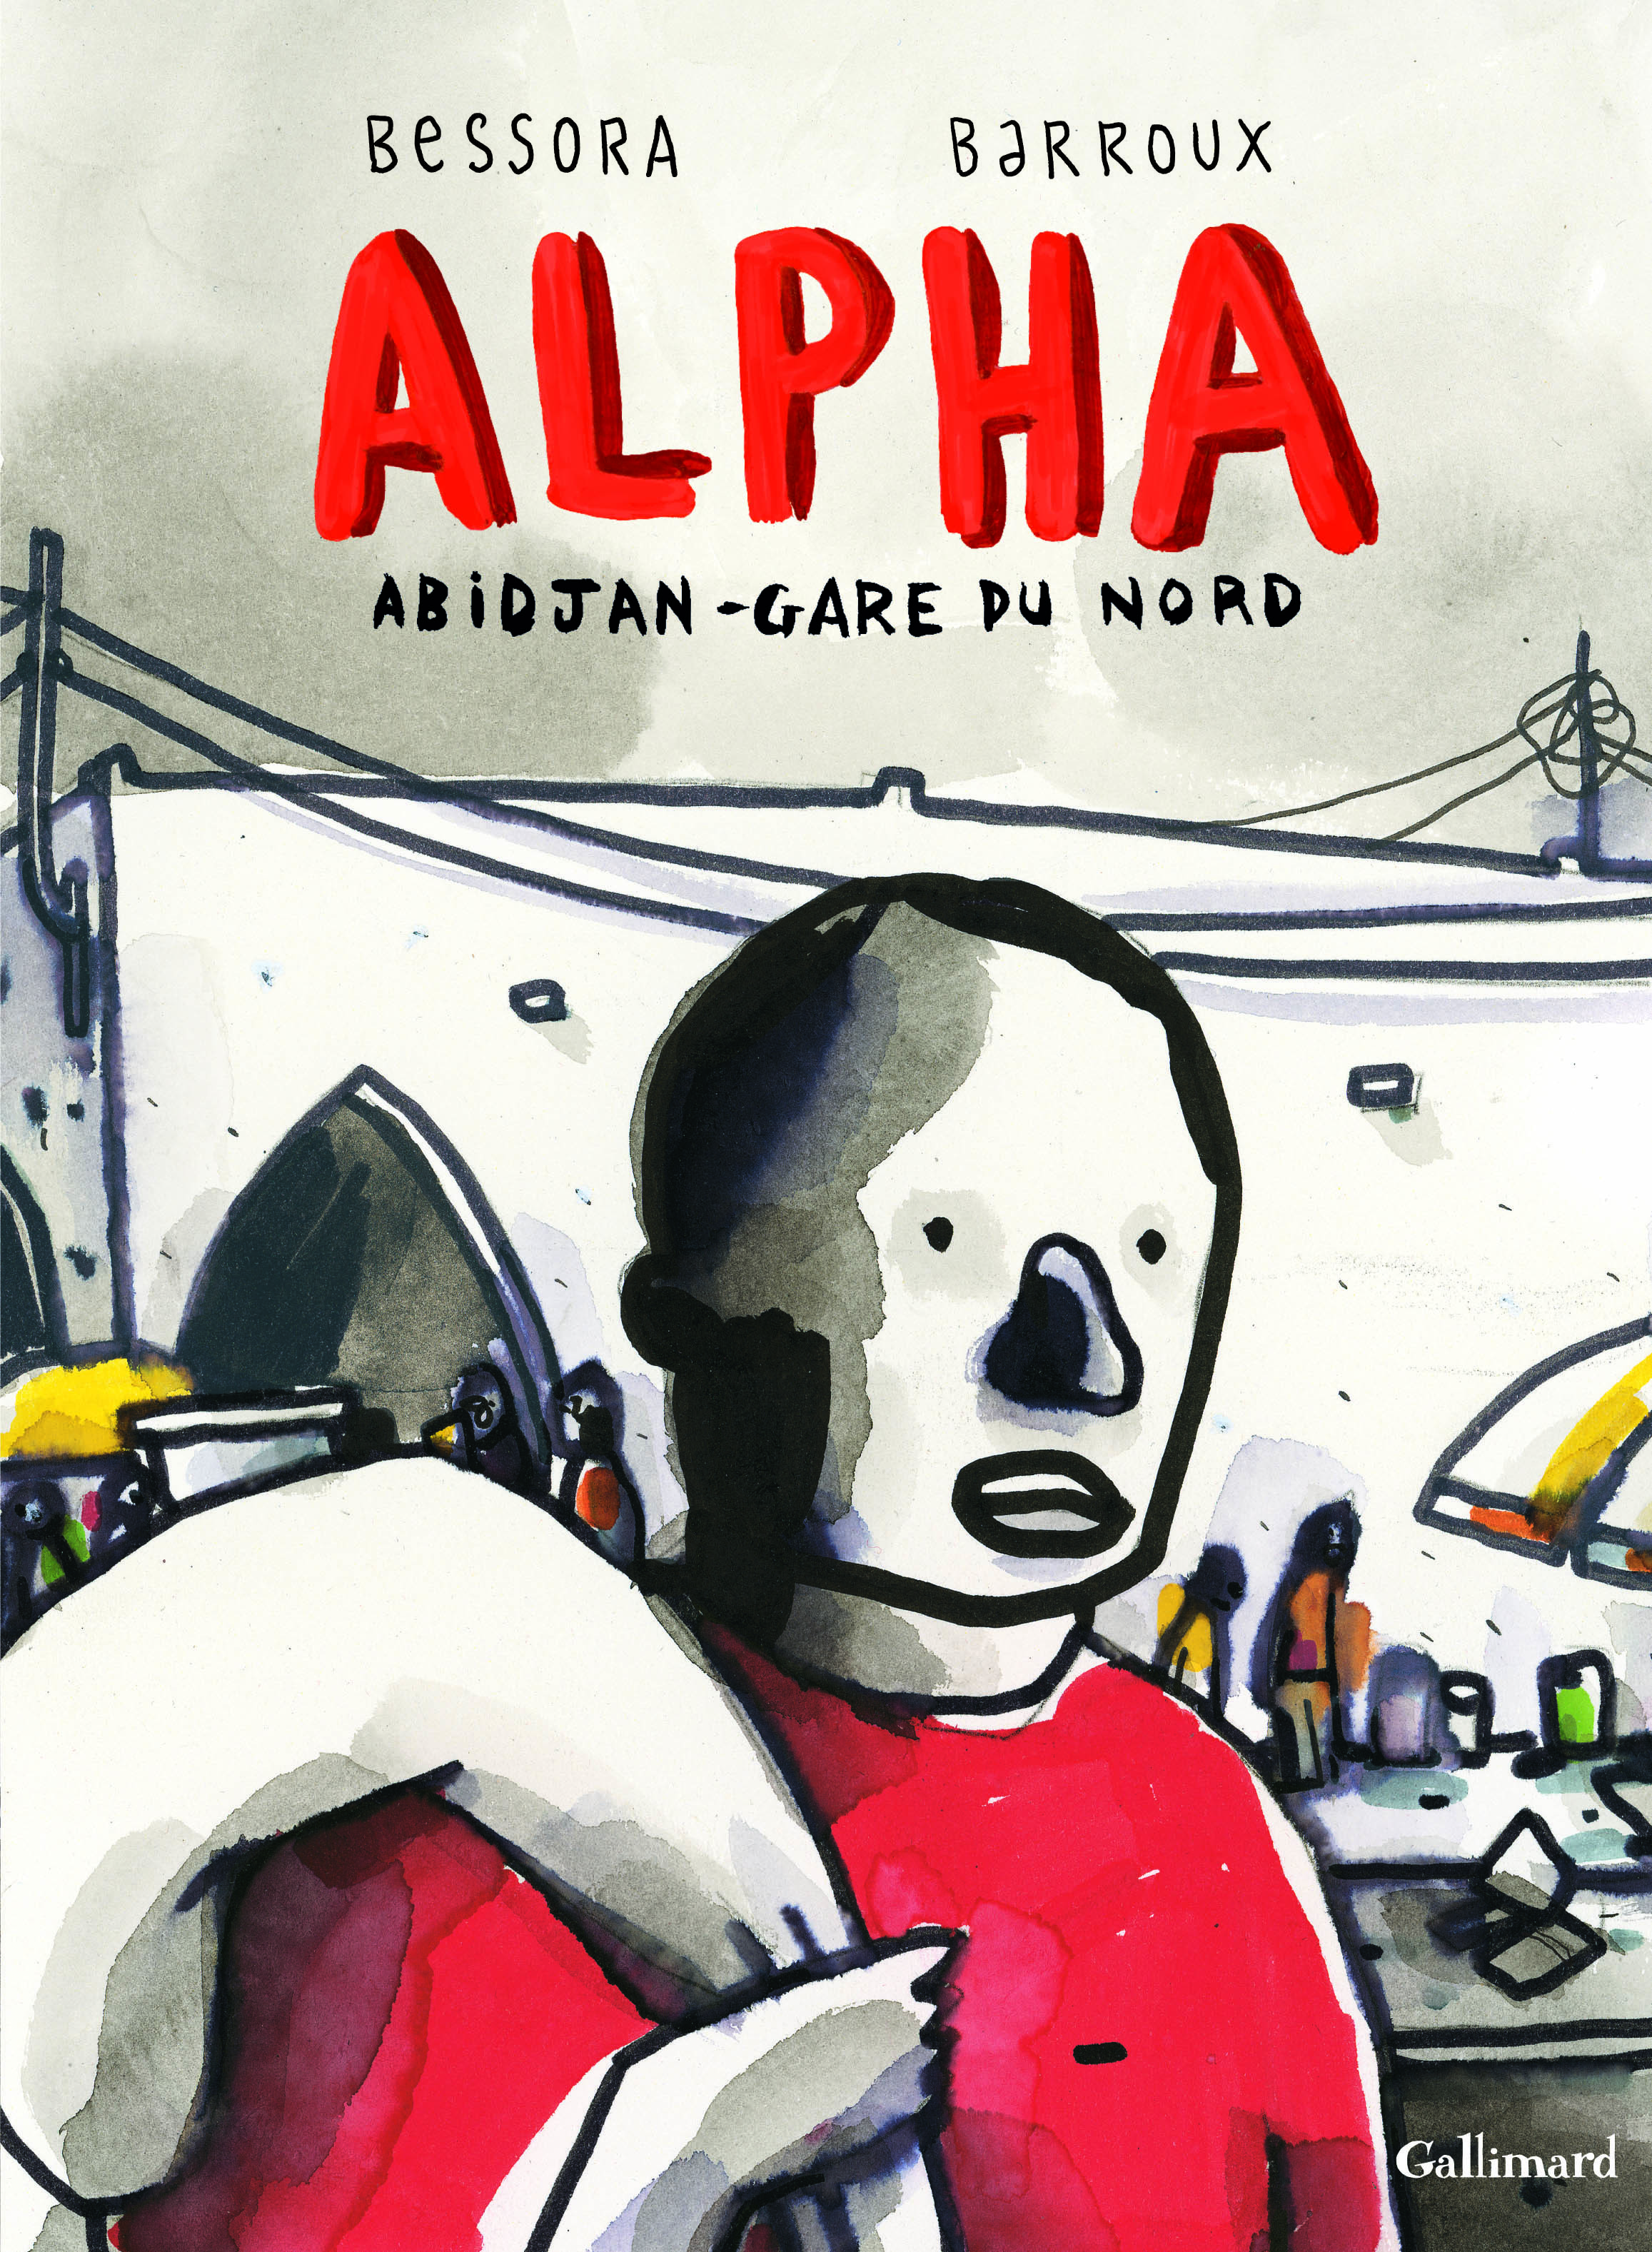 ALPHA, ABIDJAN-GARE DU NORD